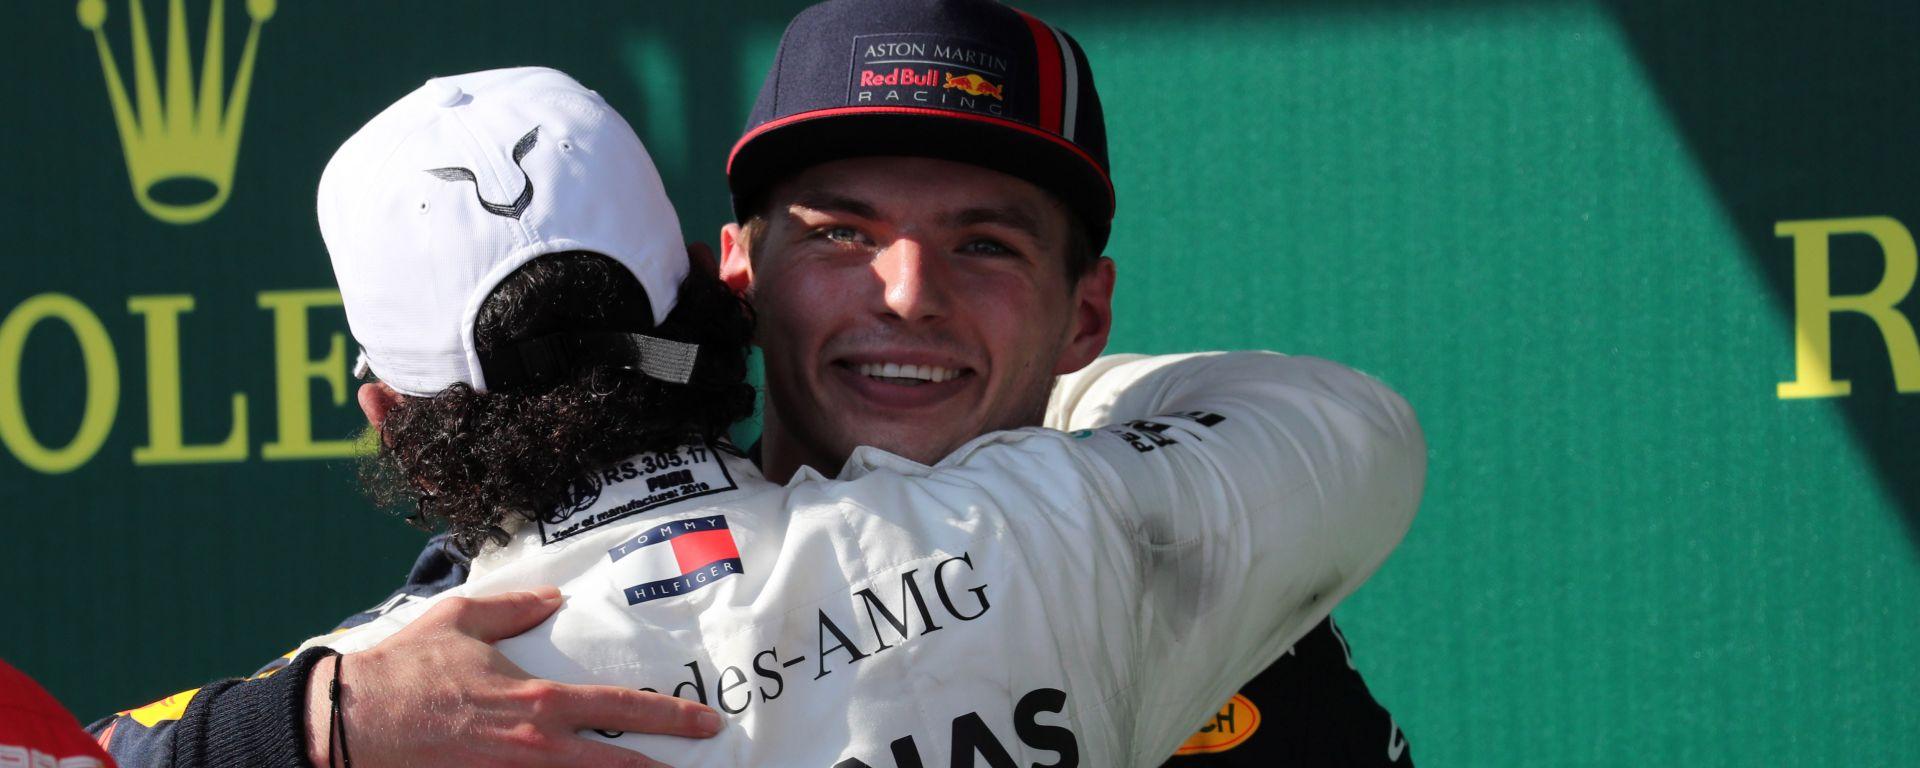 F1, GP Ungheria 2019: Lewis Hamilton (Mercedes) e Max Verstappen (Red Bull)